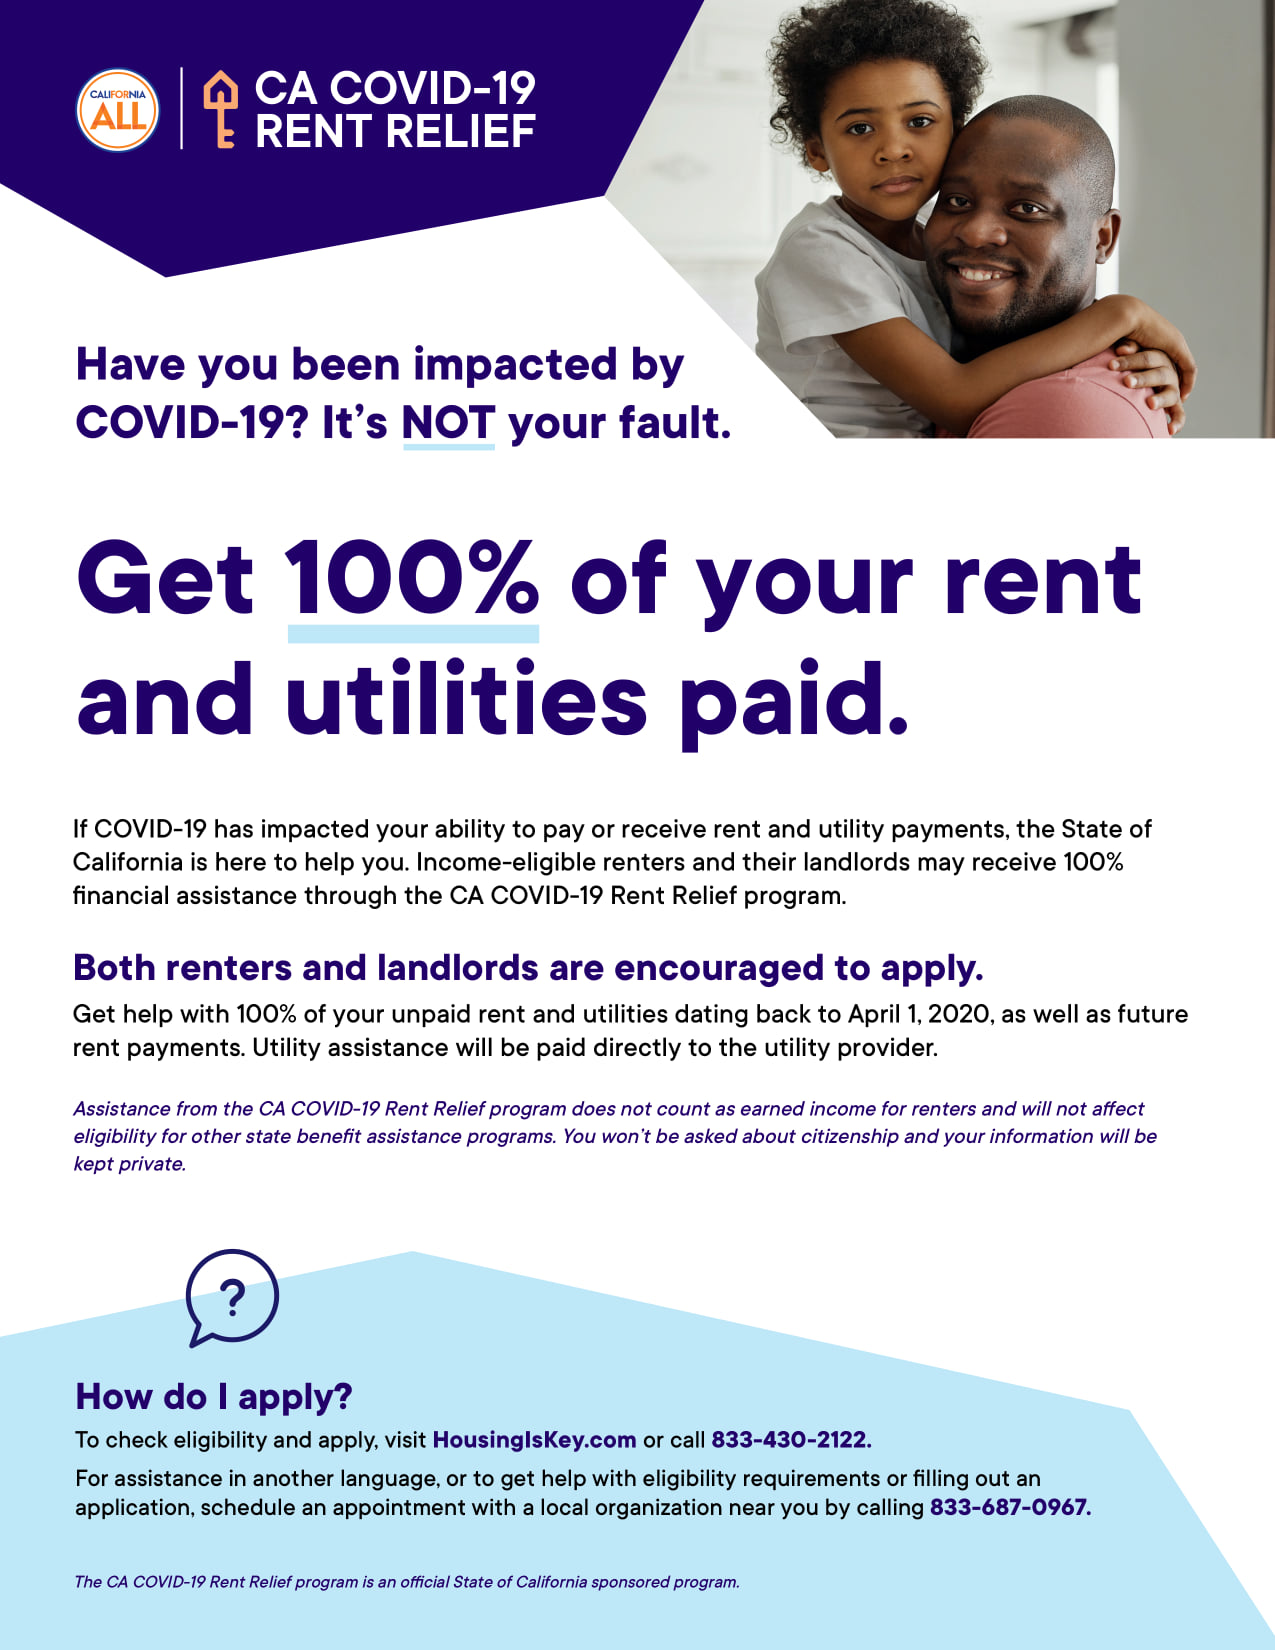 The CA COVID-19 Rent Relief Program